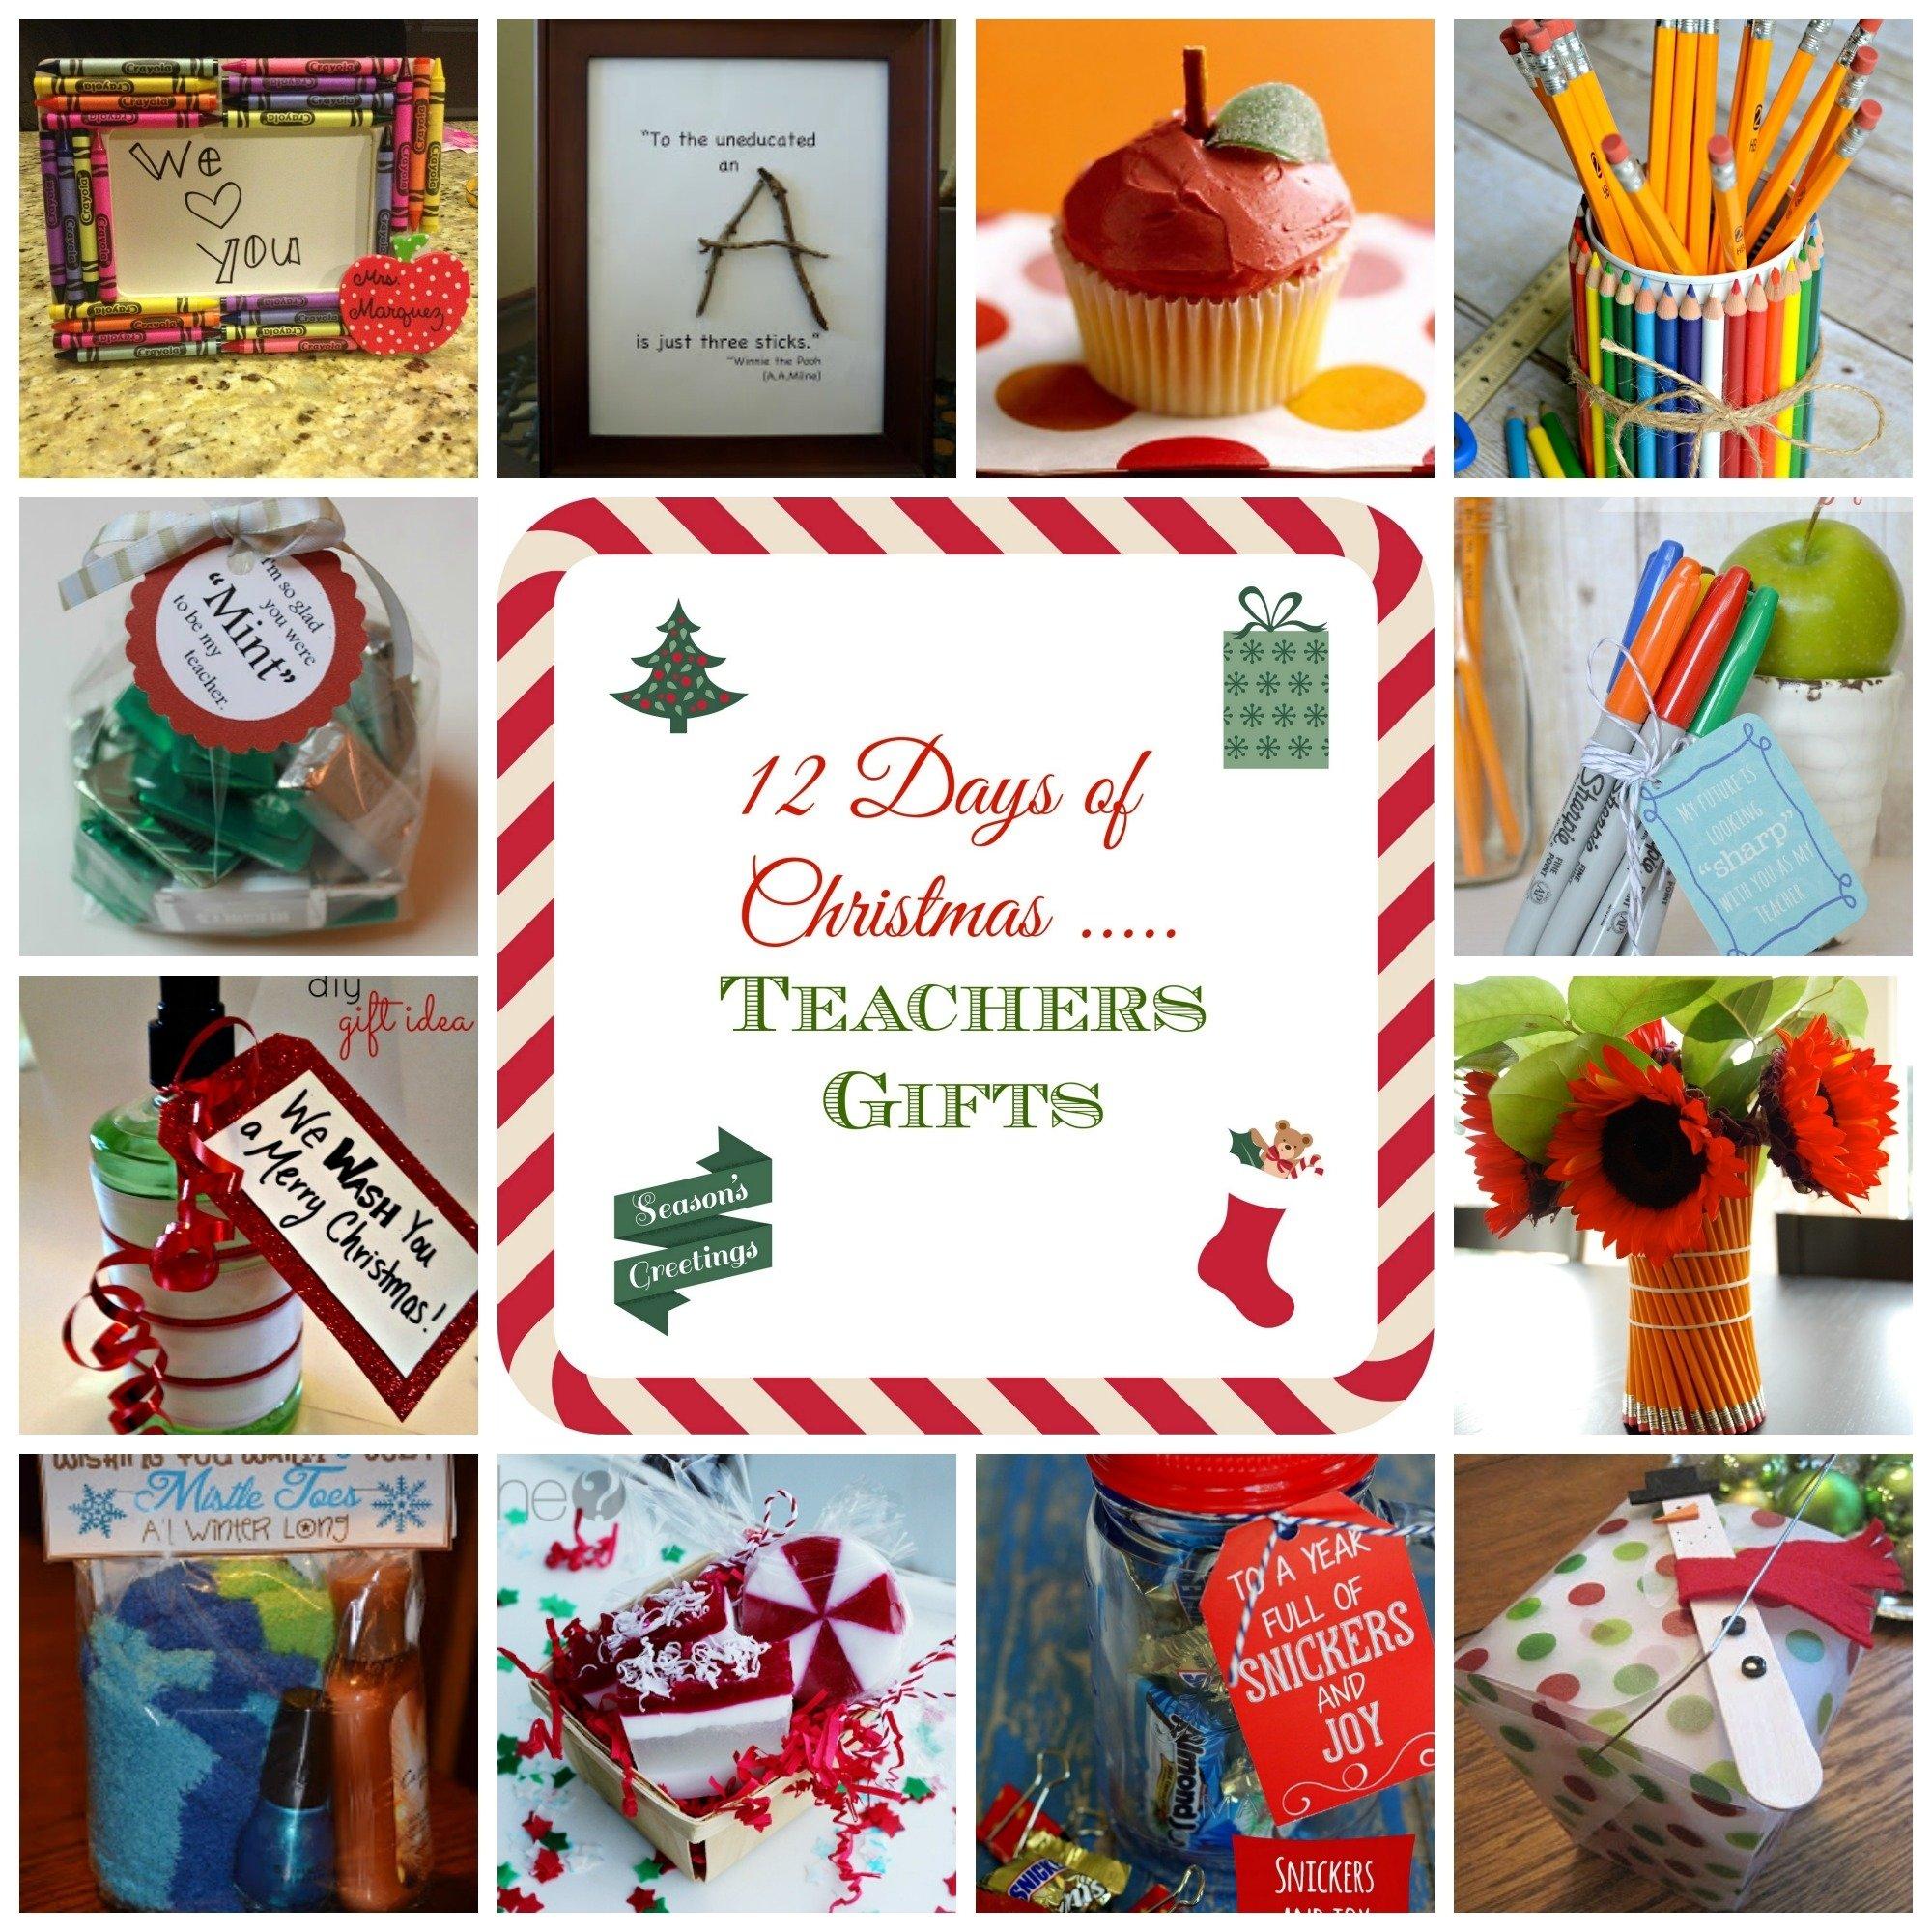 10 Spectacular 12 Days Of Christmas Gifts Ideas 12 days of christmas teacher gift ideas donnahup 1 2020